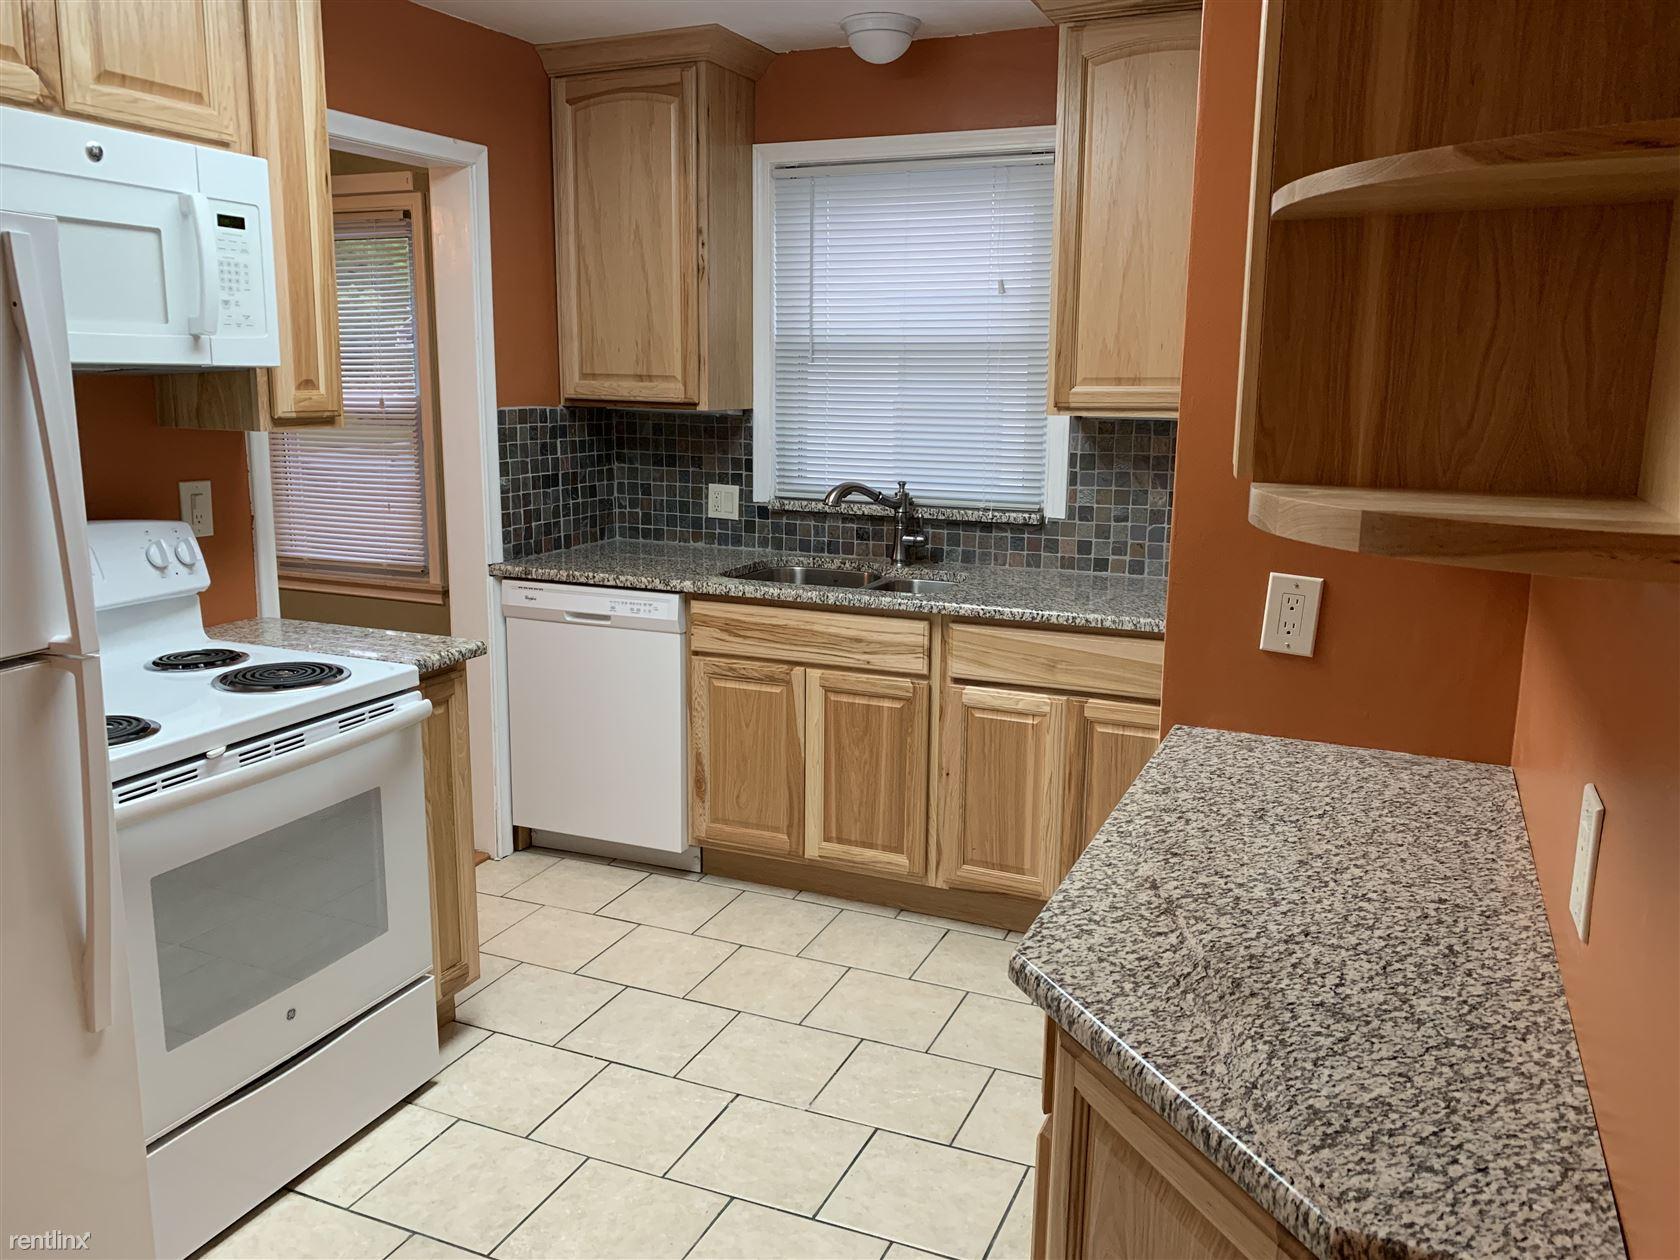 212 S Minerva Ave, Royal Oak, MI - $1,825 USD/ month